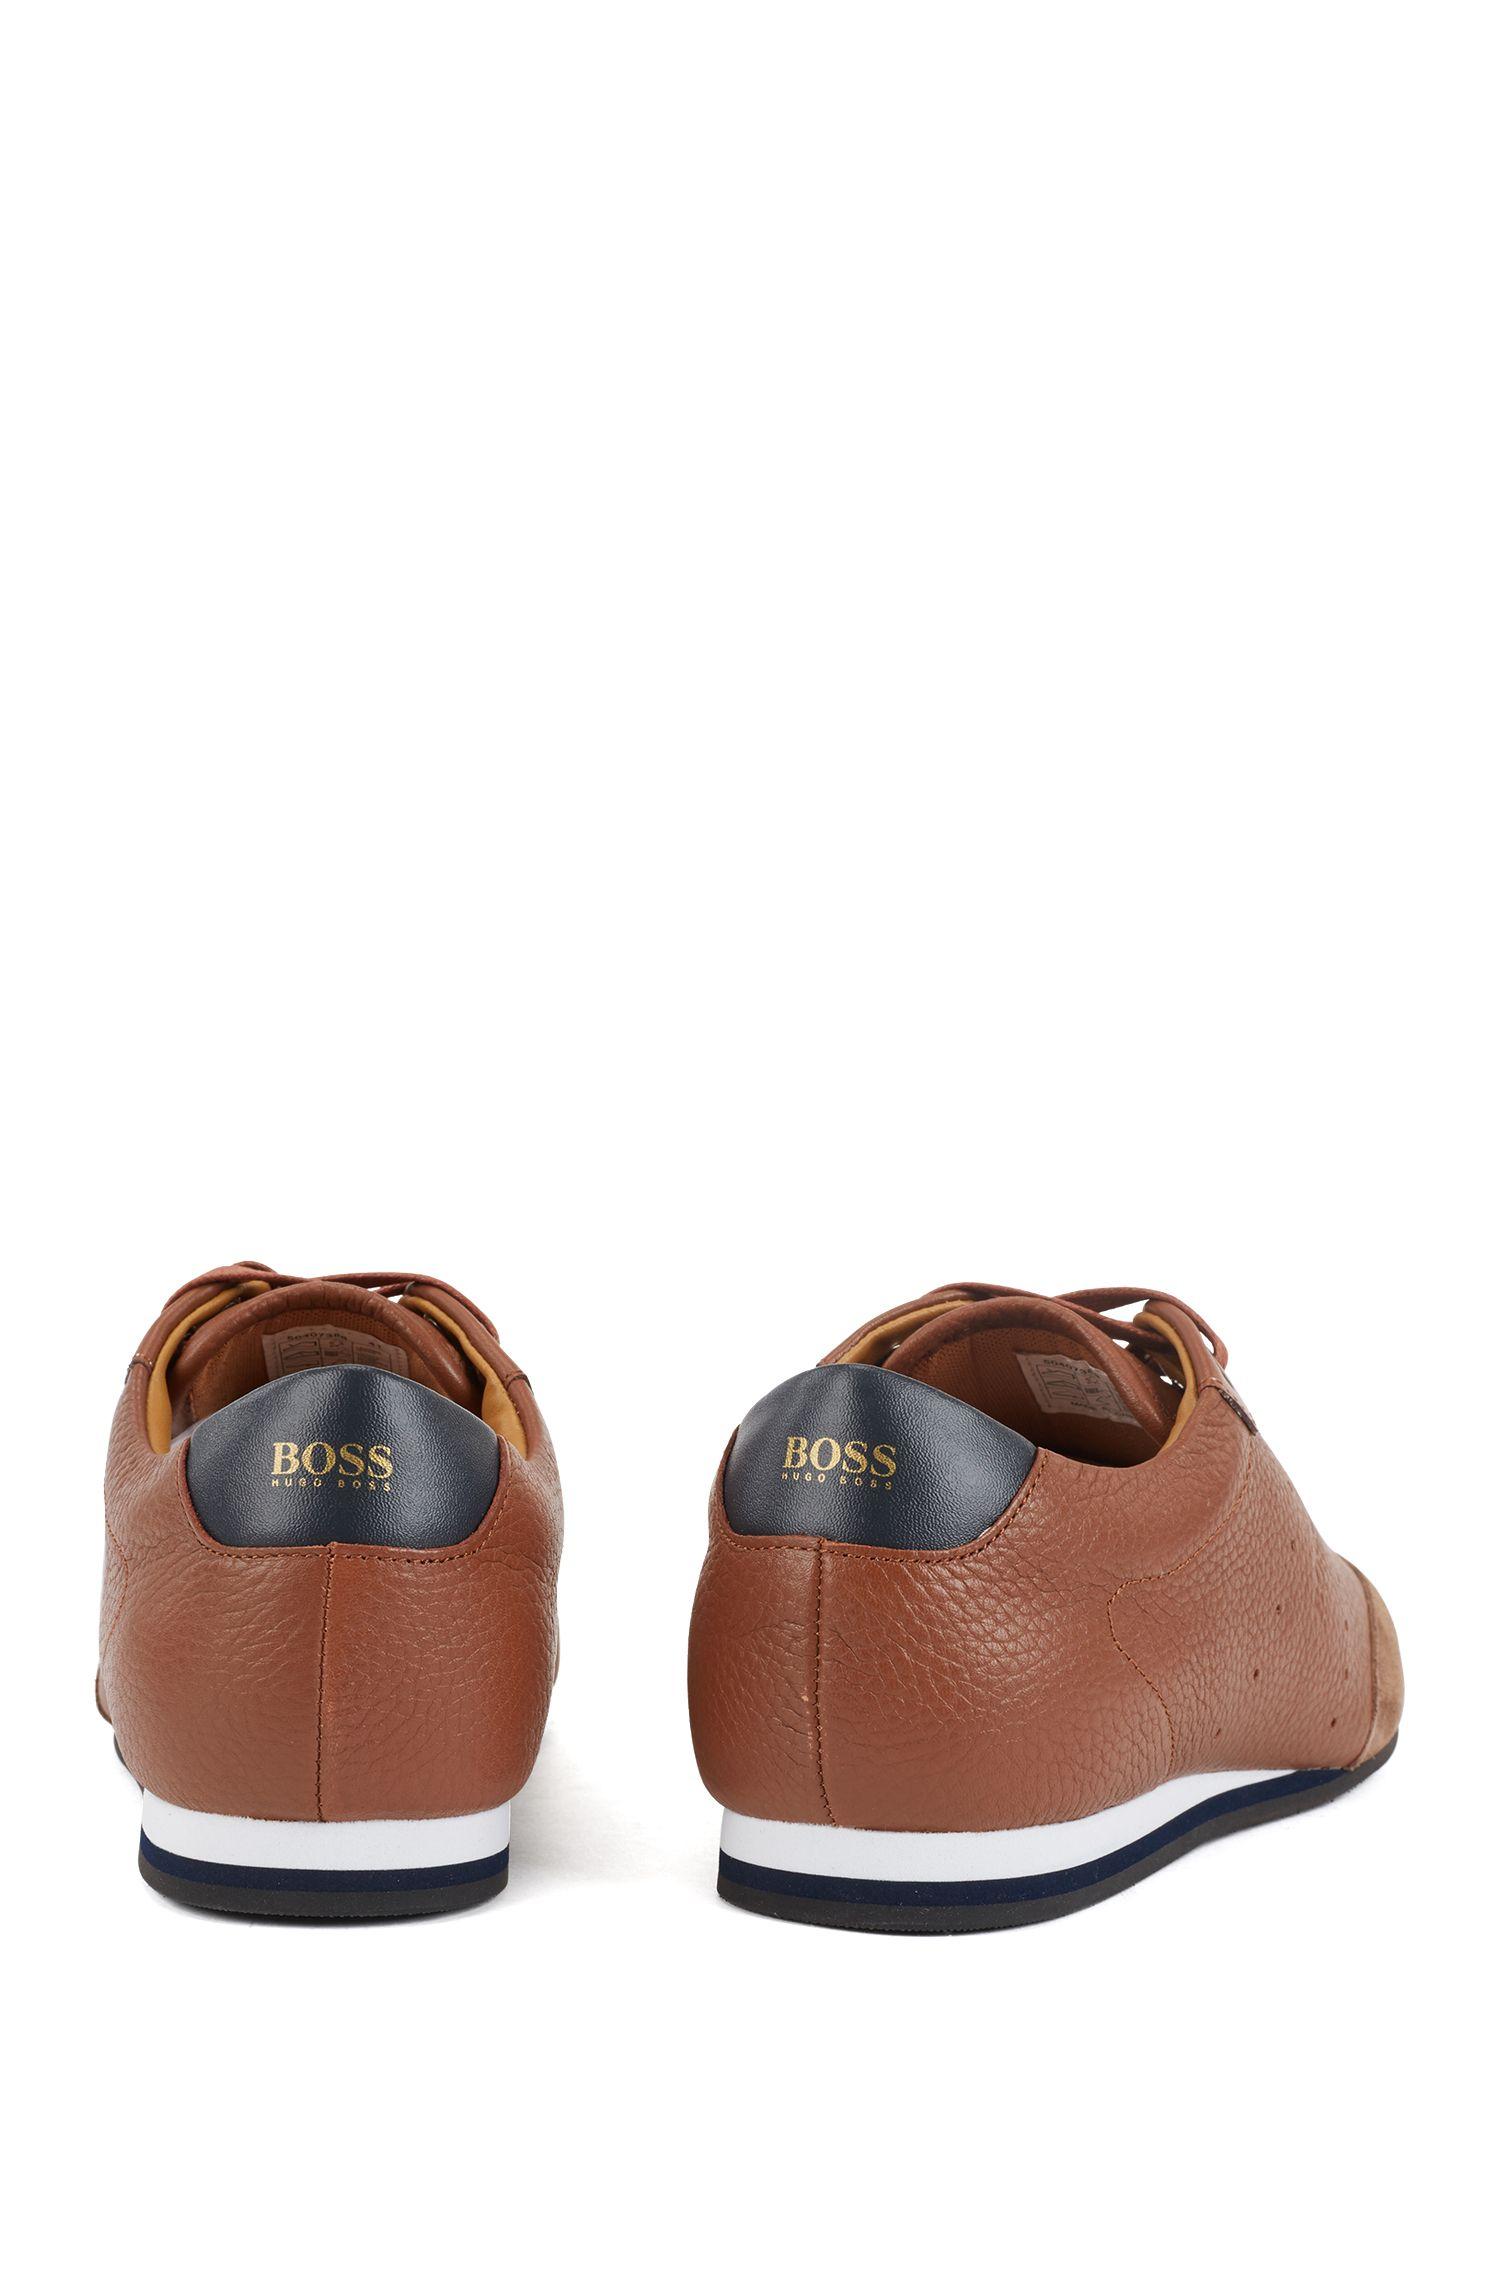 Hugo Boss - Lowtop Sneakers aus Veloursleder und gewalktem Leder - 6